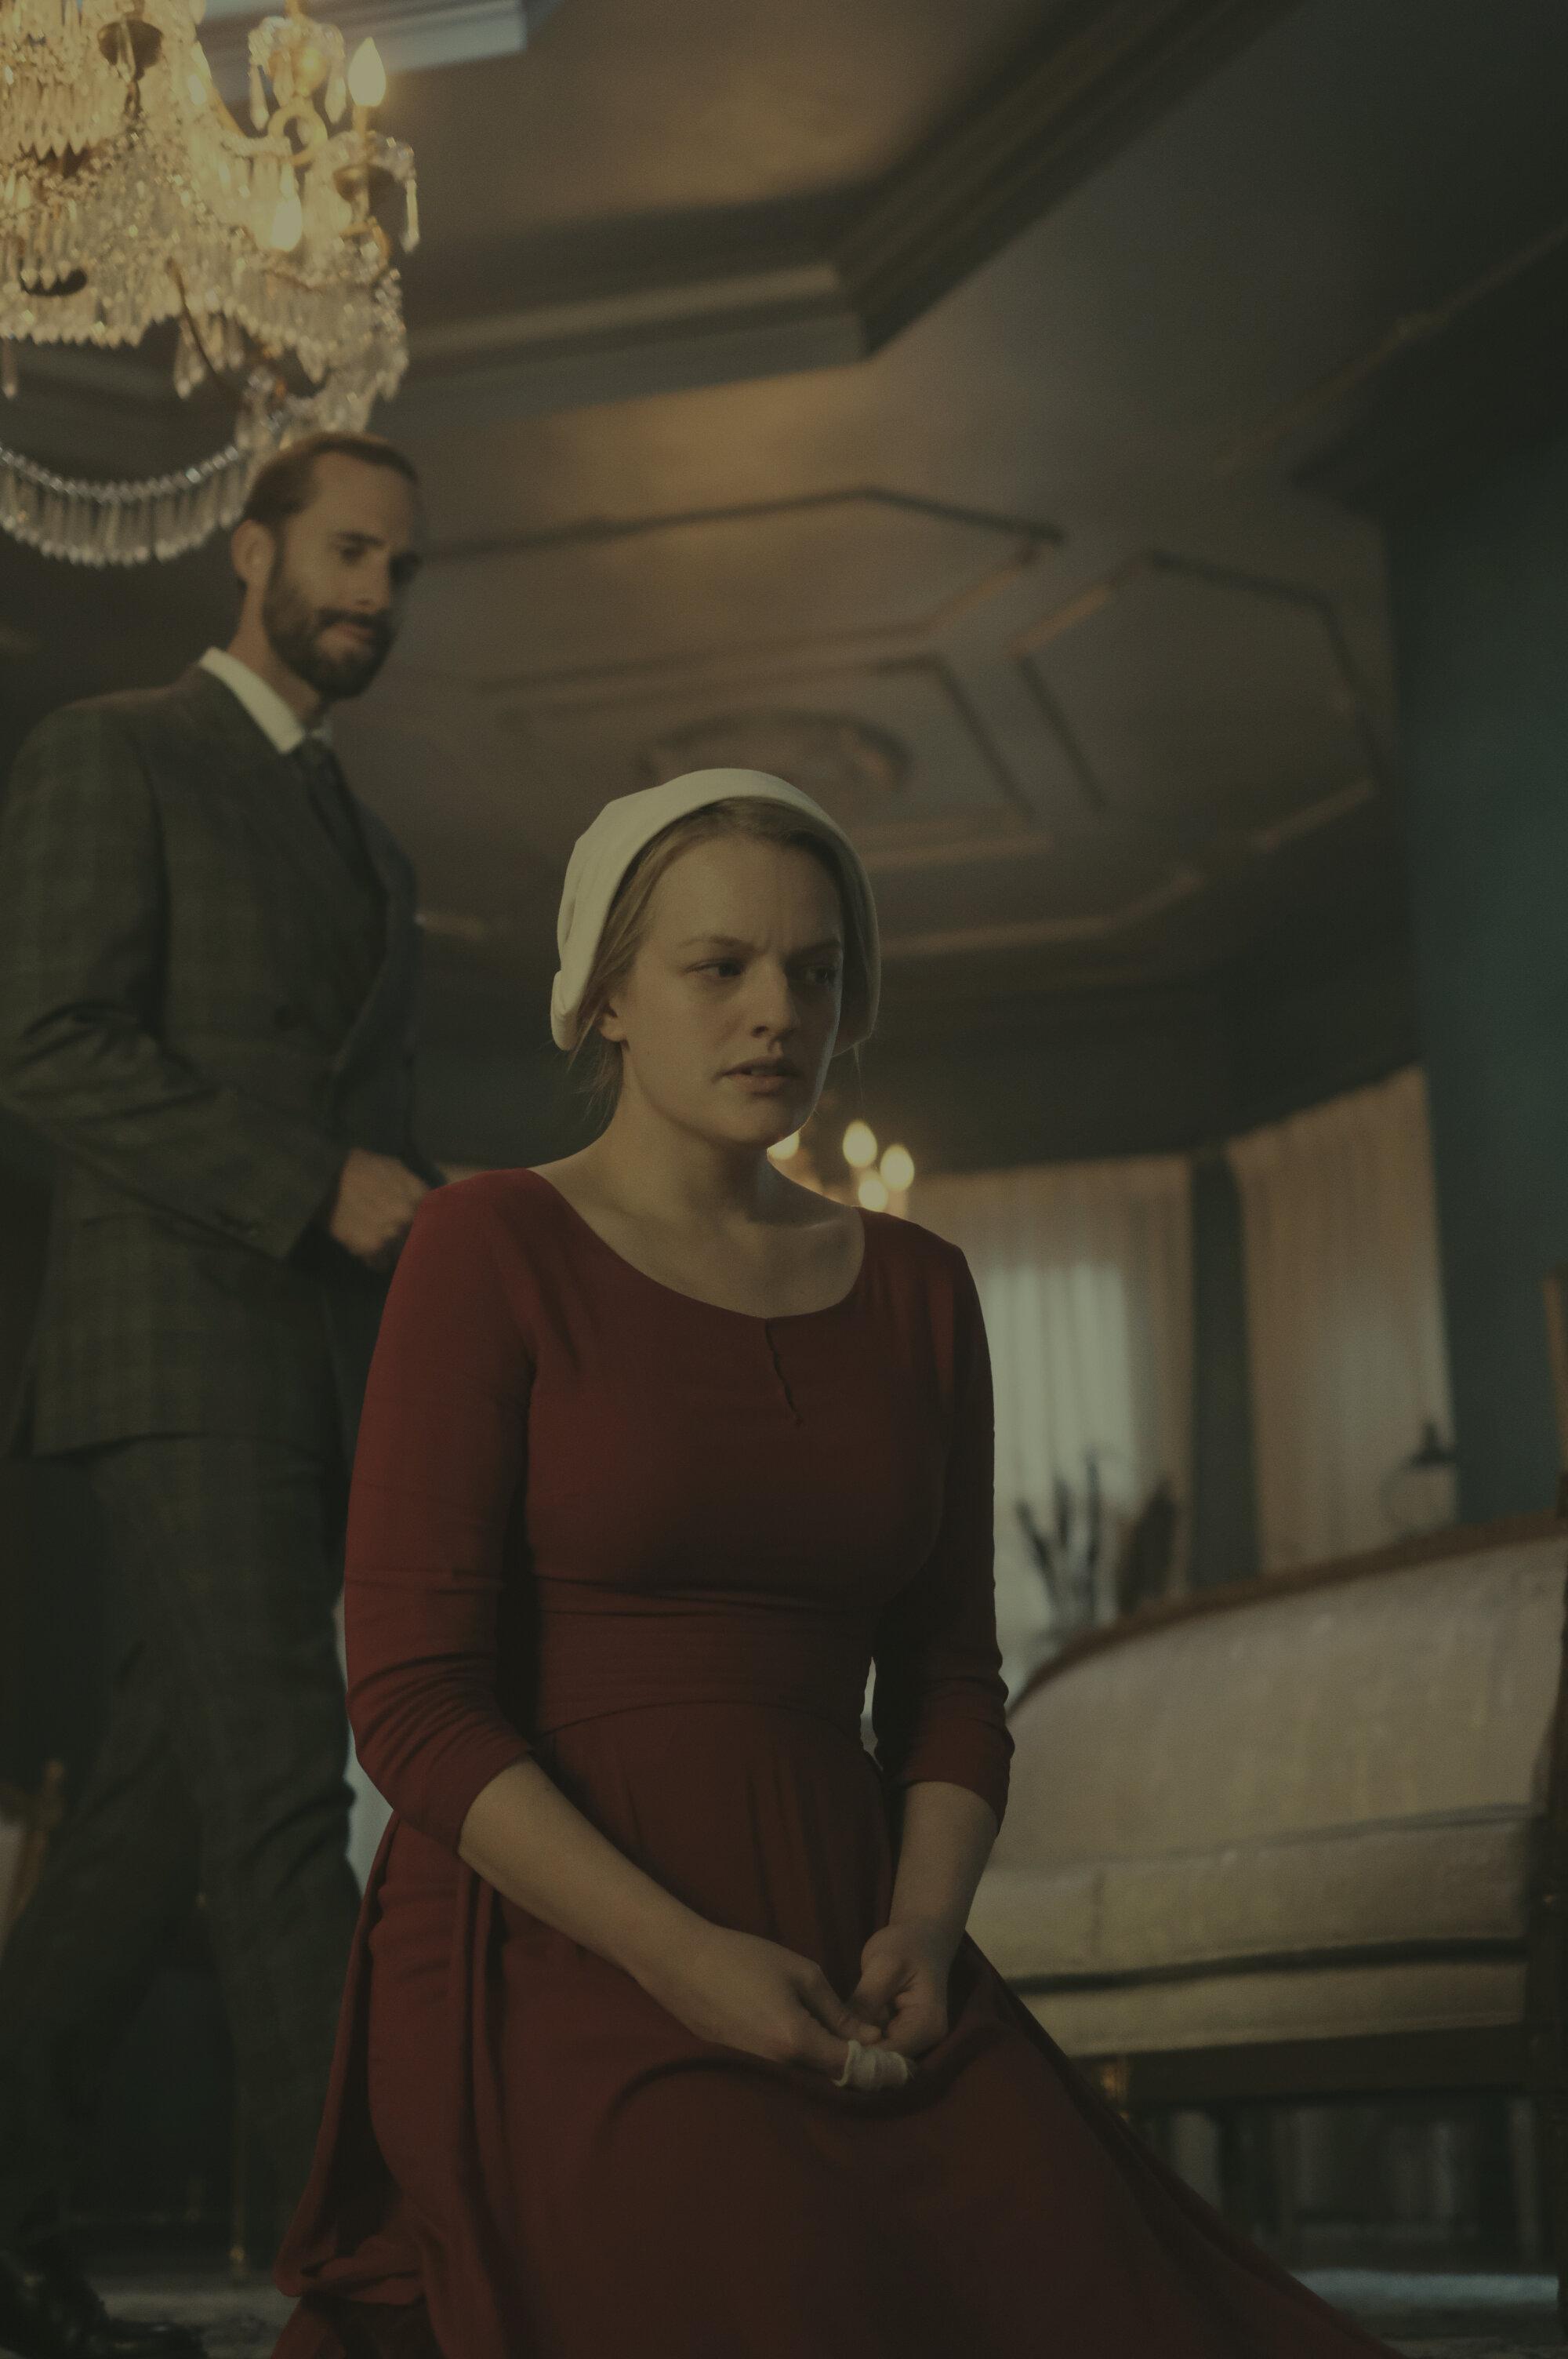 The Handmaid's Tale : La servante écarlate - Nolite te bastardes carborundorum